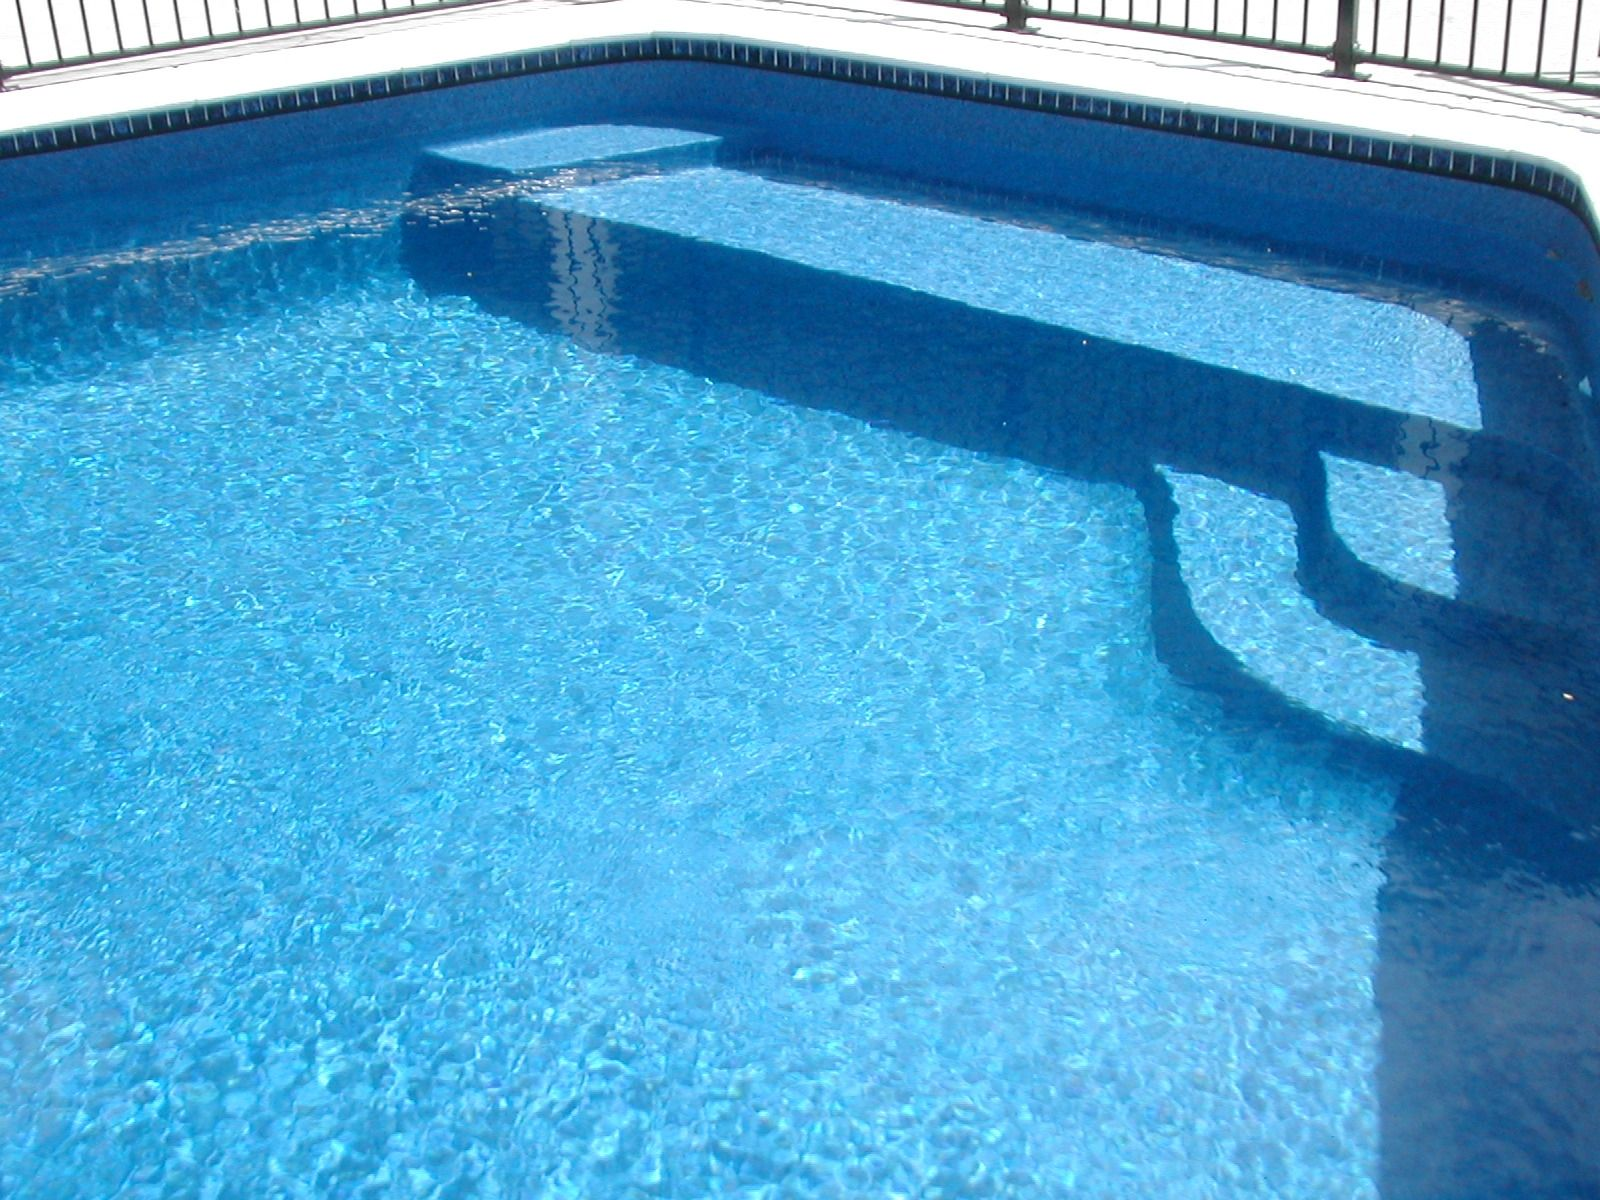 Swiming Pools Vinyl Pool Liners Beautiful Design With Inground ...